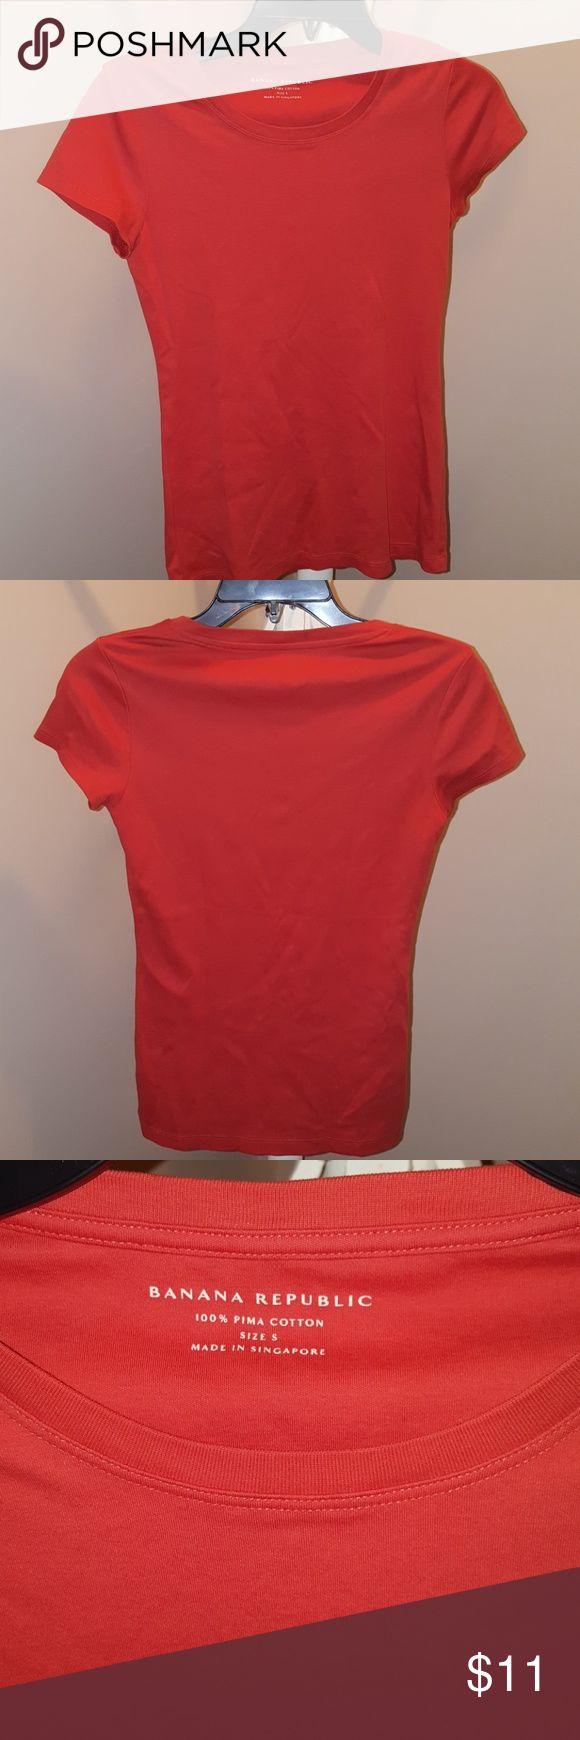 Banana Republic Orange T-shirt Banana Republic Orange T-shirt 100% Pima Cotton Banana Republic Tops Tees - Short Sleeve